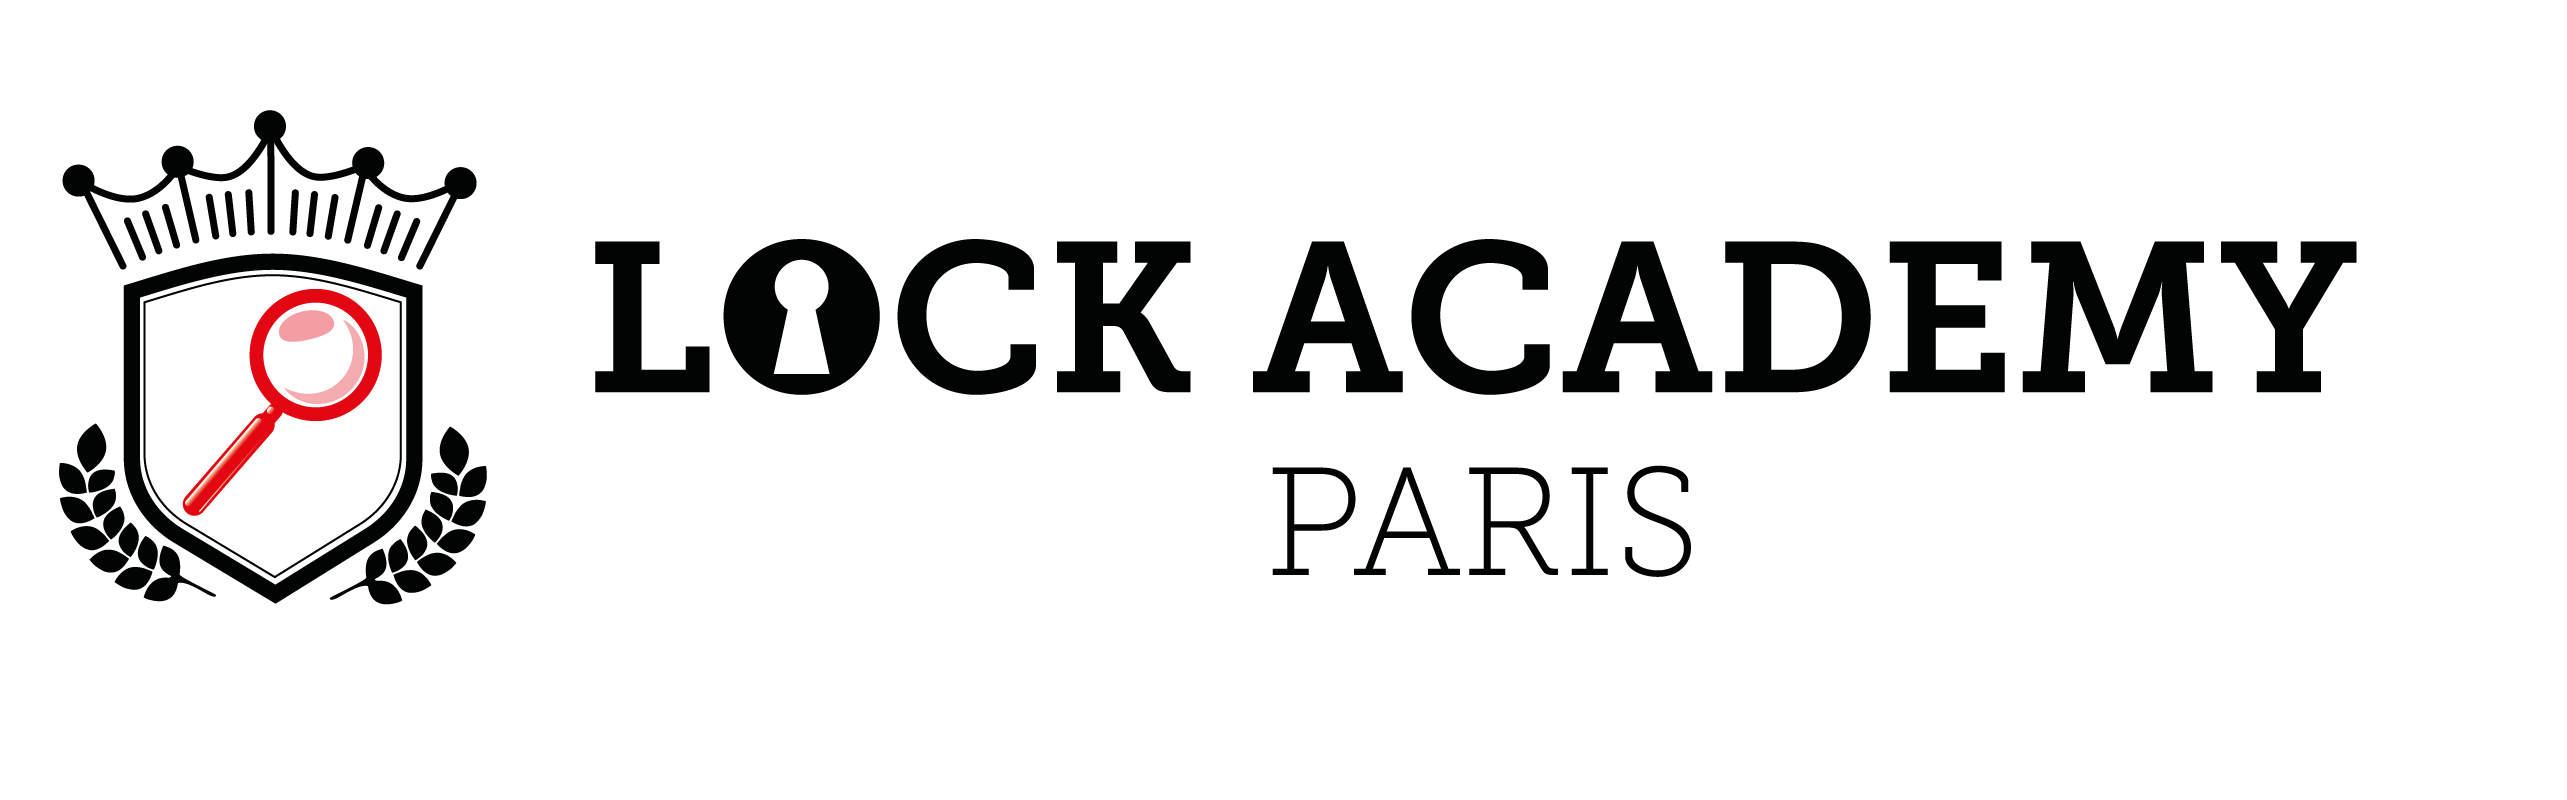 Lock Academy